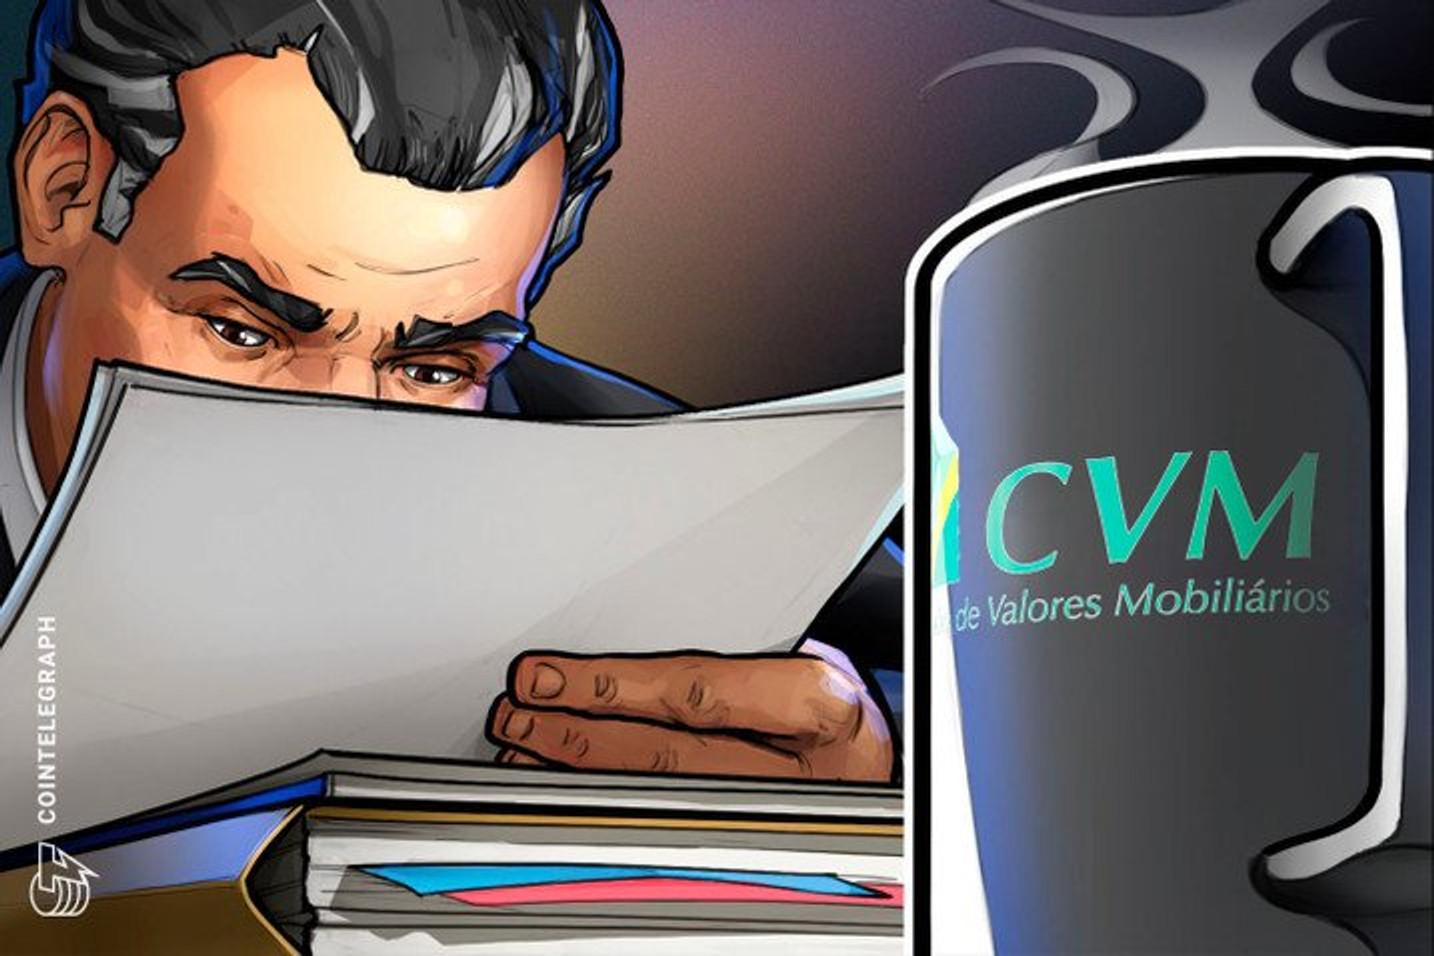 Depois de proibir Latoex da brasileira E-Juno, CVM arquiva caso